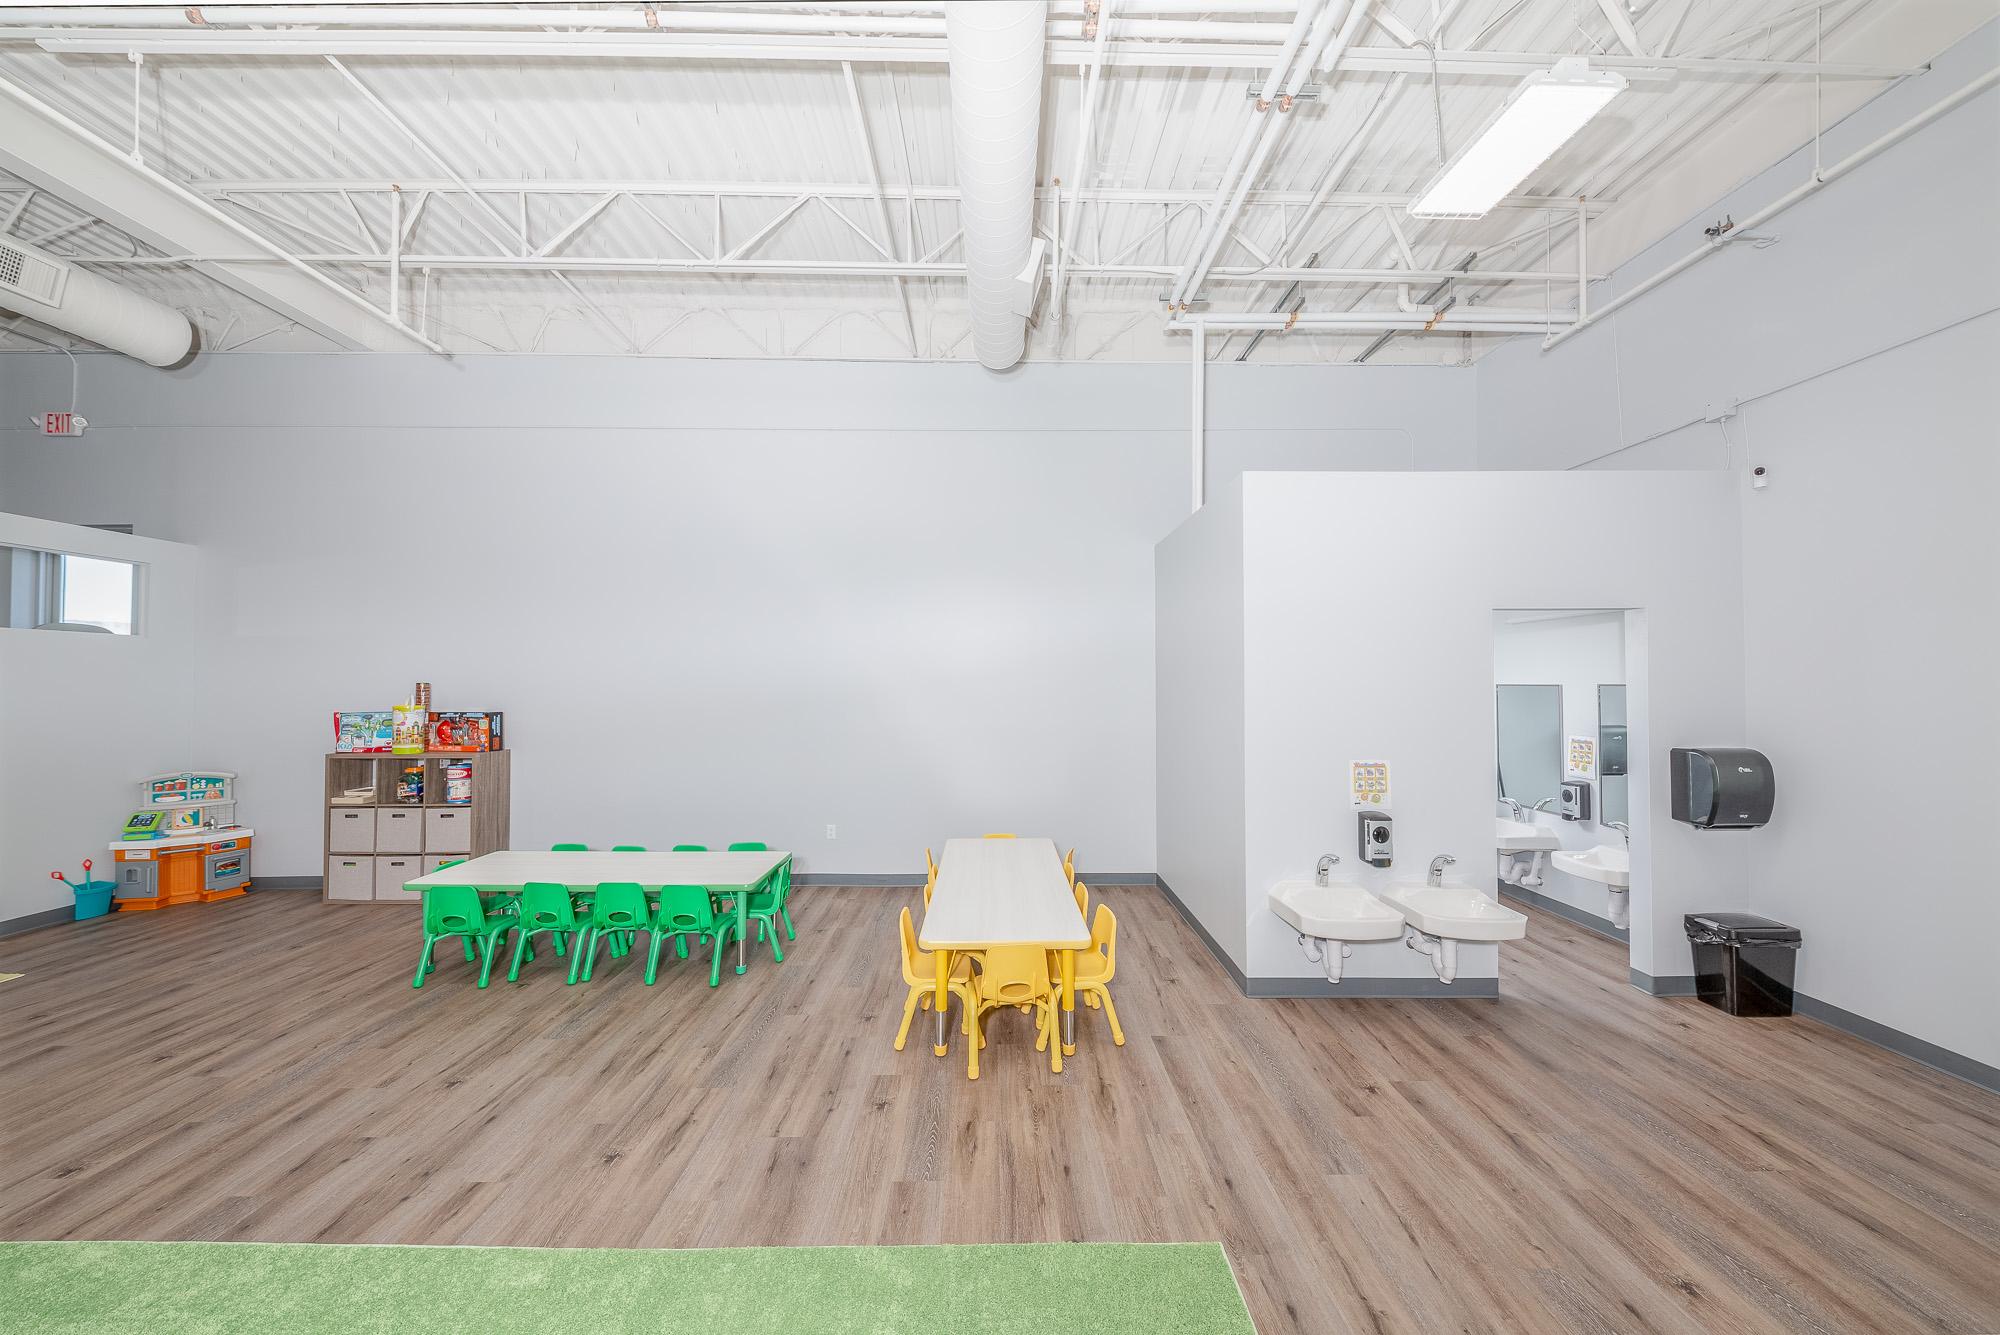 Smart Start Daycare & Preschool - Classroom